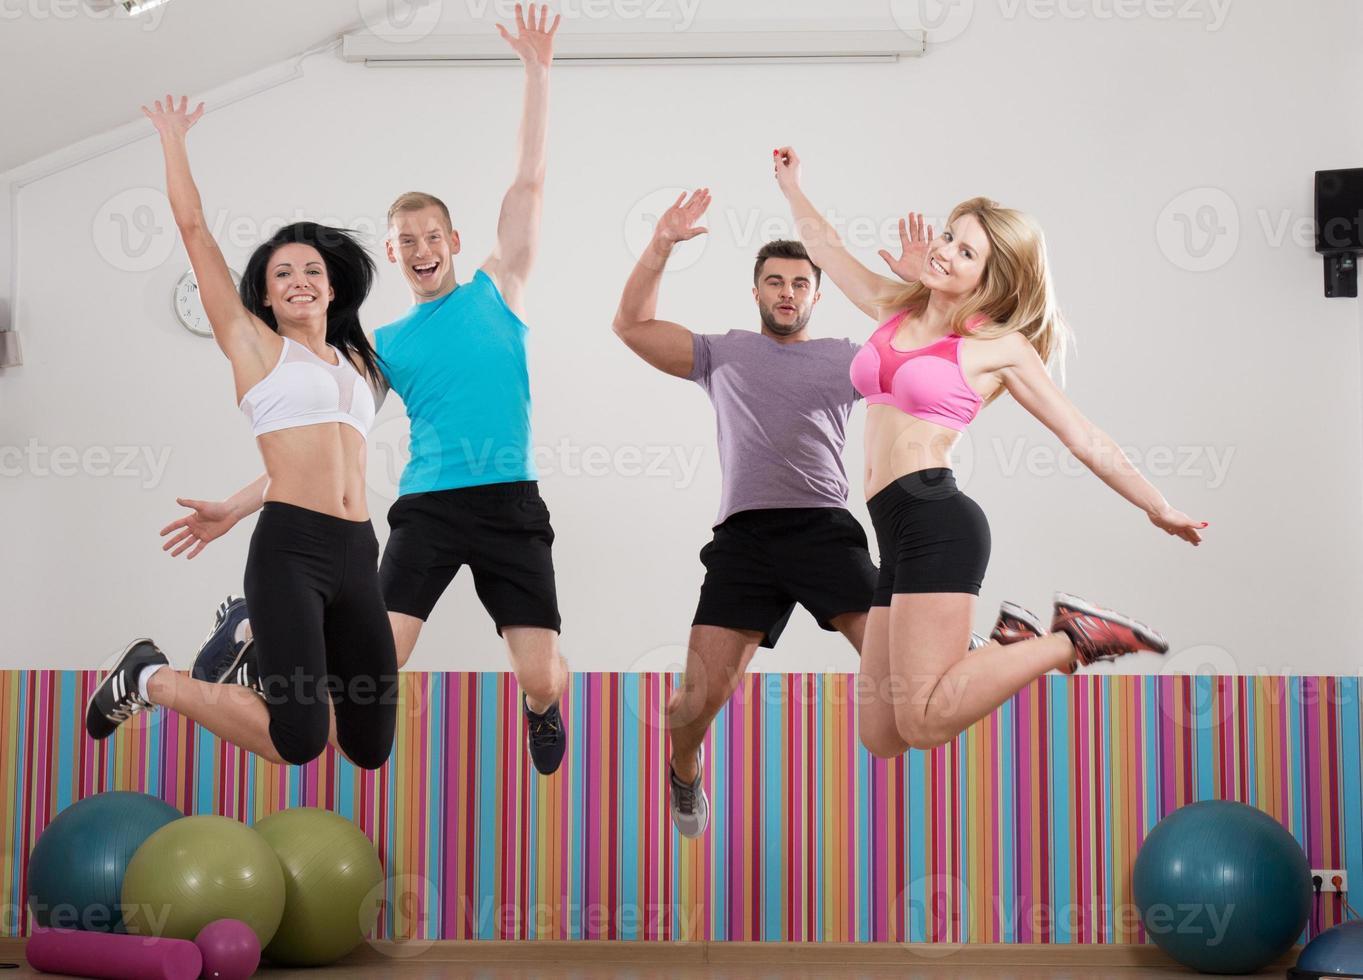 equipe de atletas feliz e sorridente foto